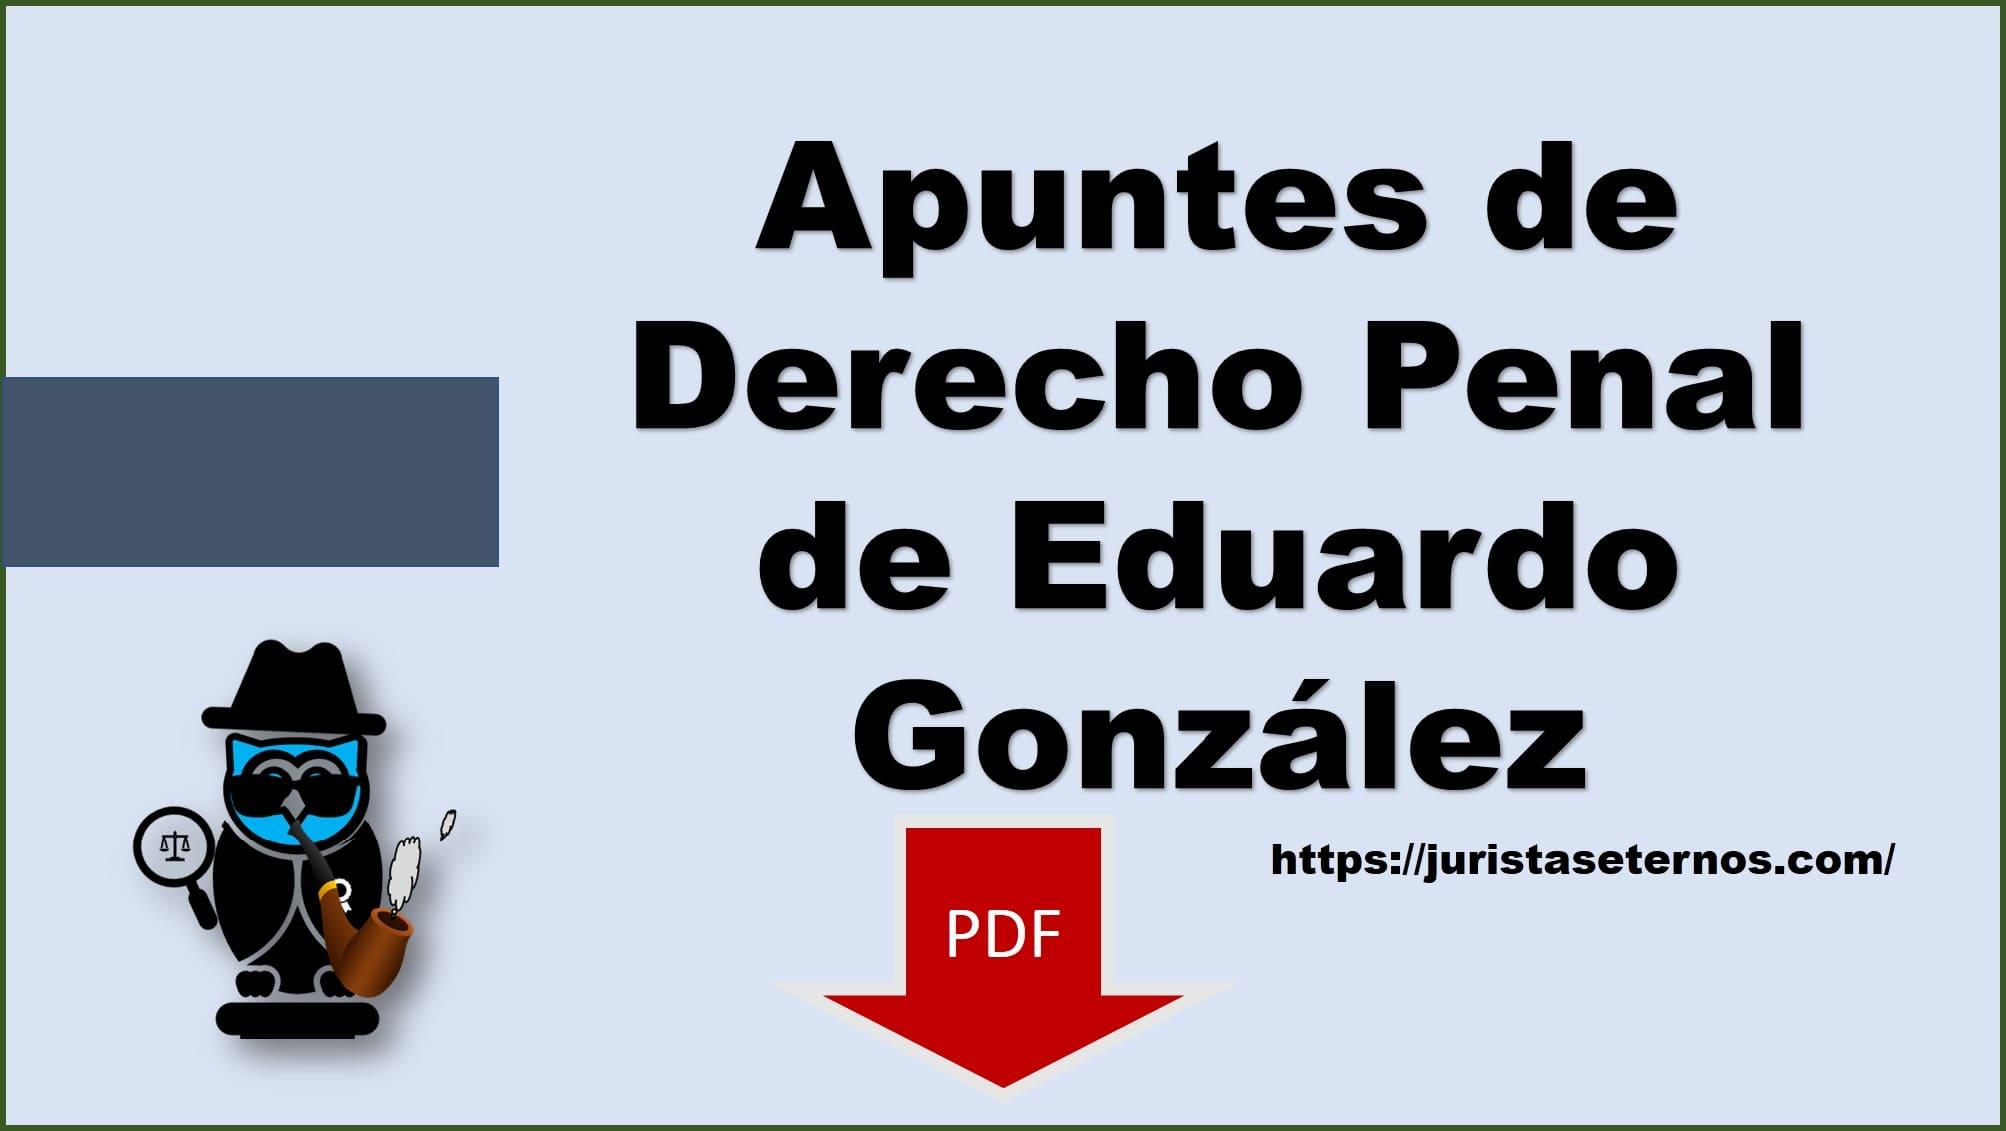 apuntes de derecho penal guatemalteco eduardo gonzalez pdf